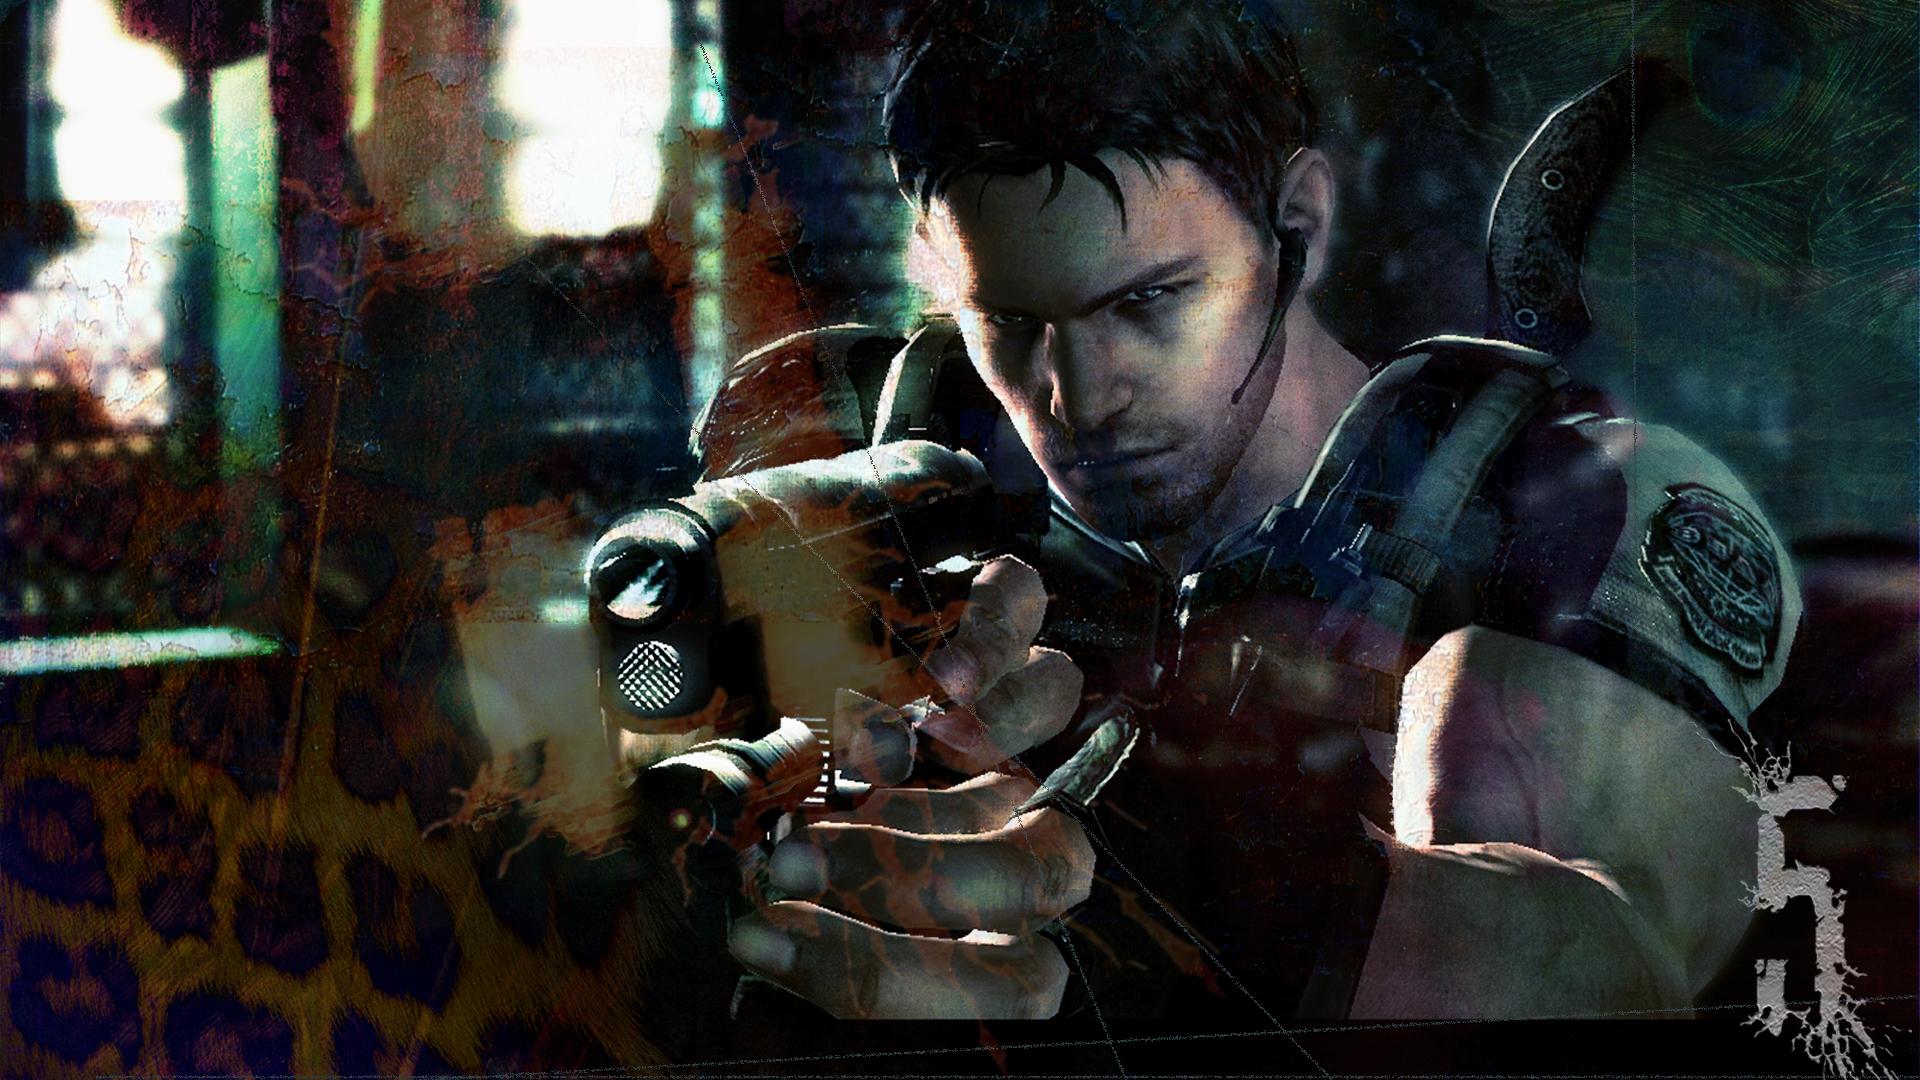 Free Download Berserker Tear Through The Game Resident Evil 5